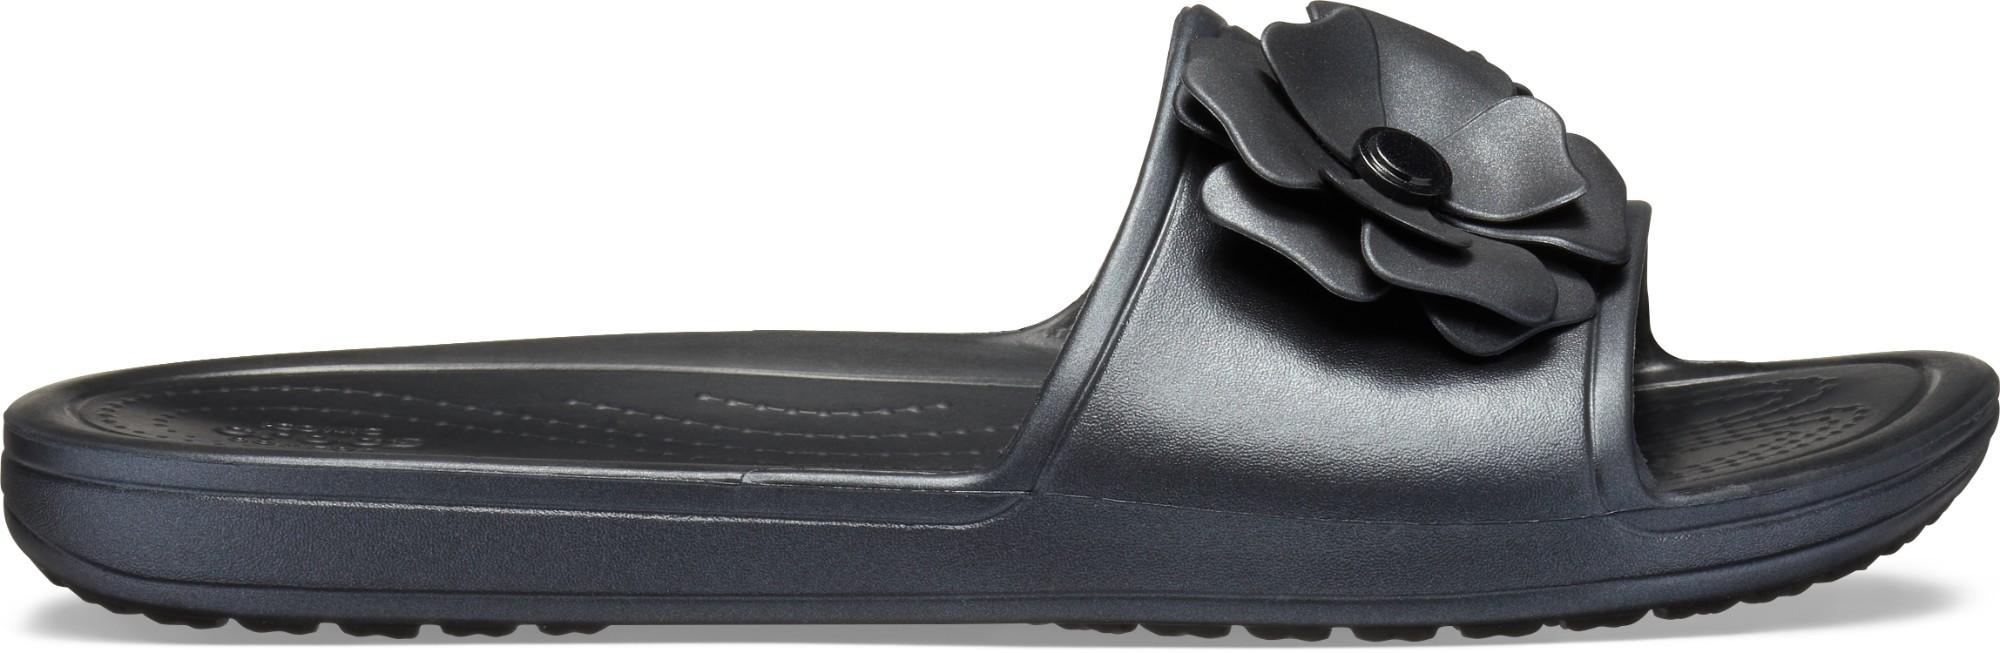 Crocs™ Sloane Vivid Blooms Slide Women's Black/Black 38,5